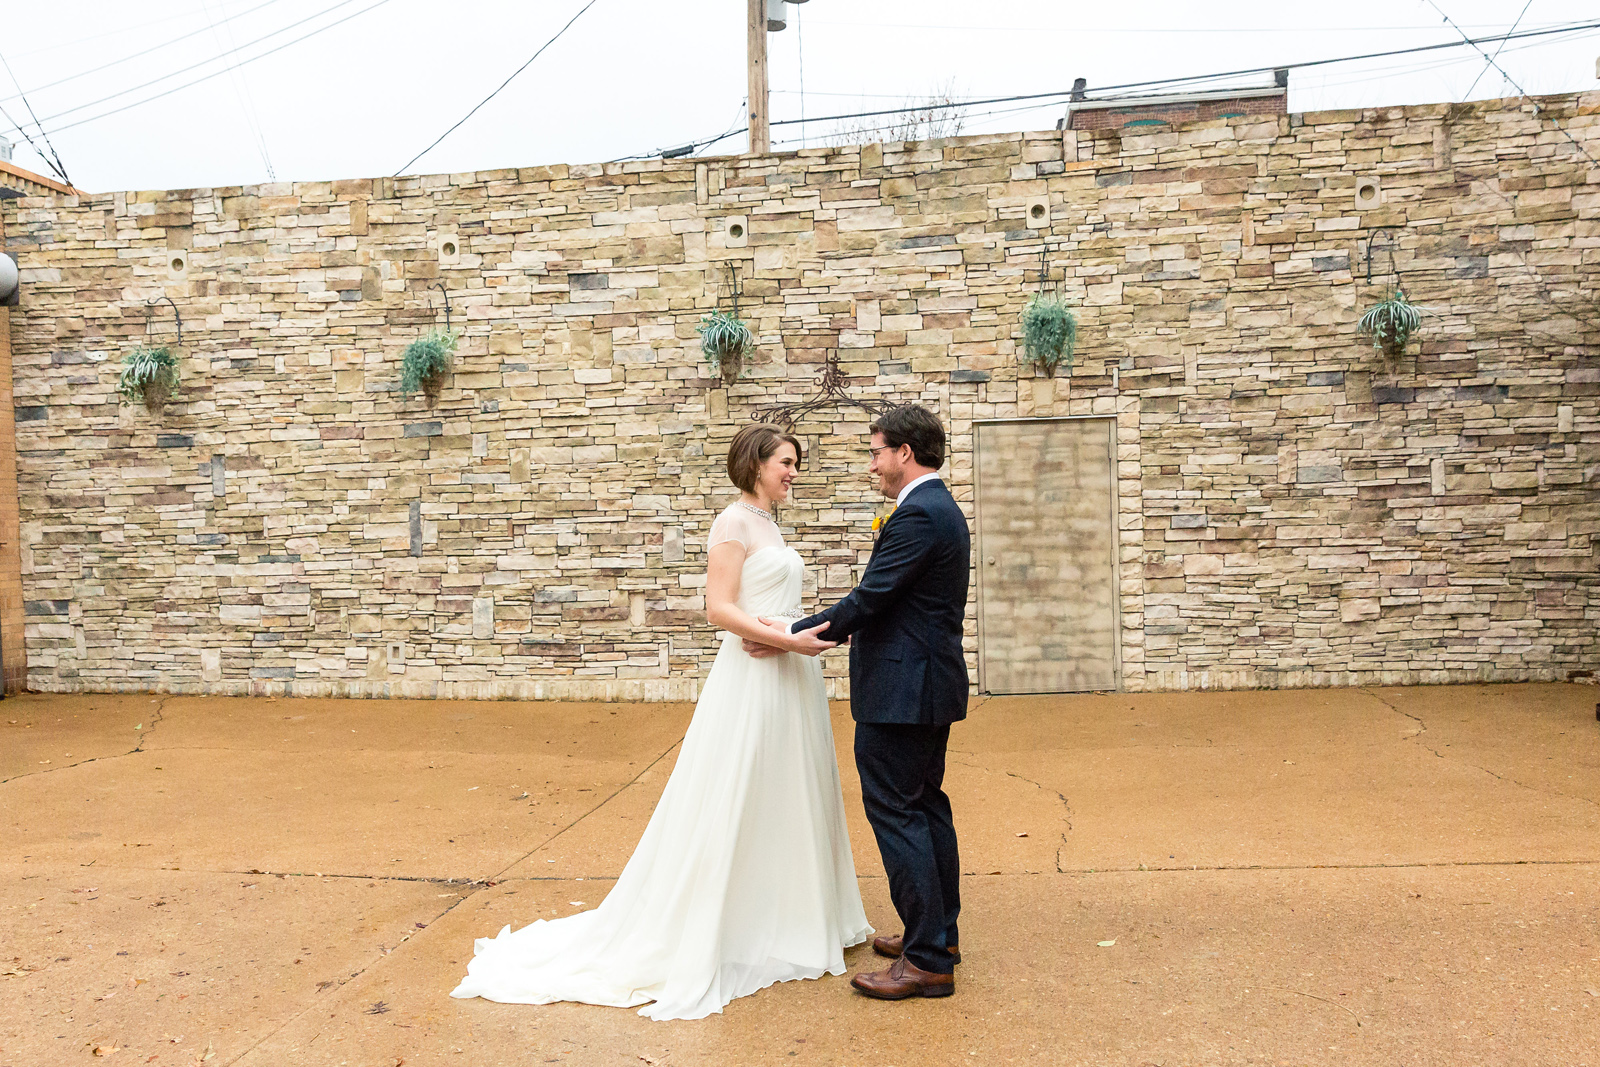 Oldani Photography-St Louis-Wedding Photos-wedding photographer-First Look-Mad Art Gallery_20141122_14365404.jpg